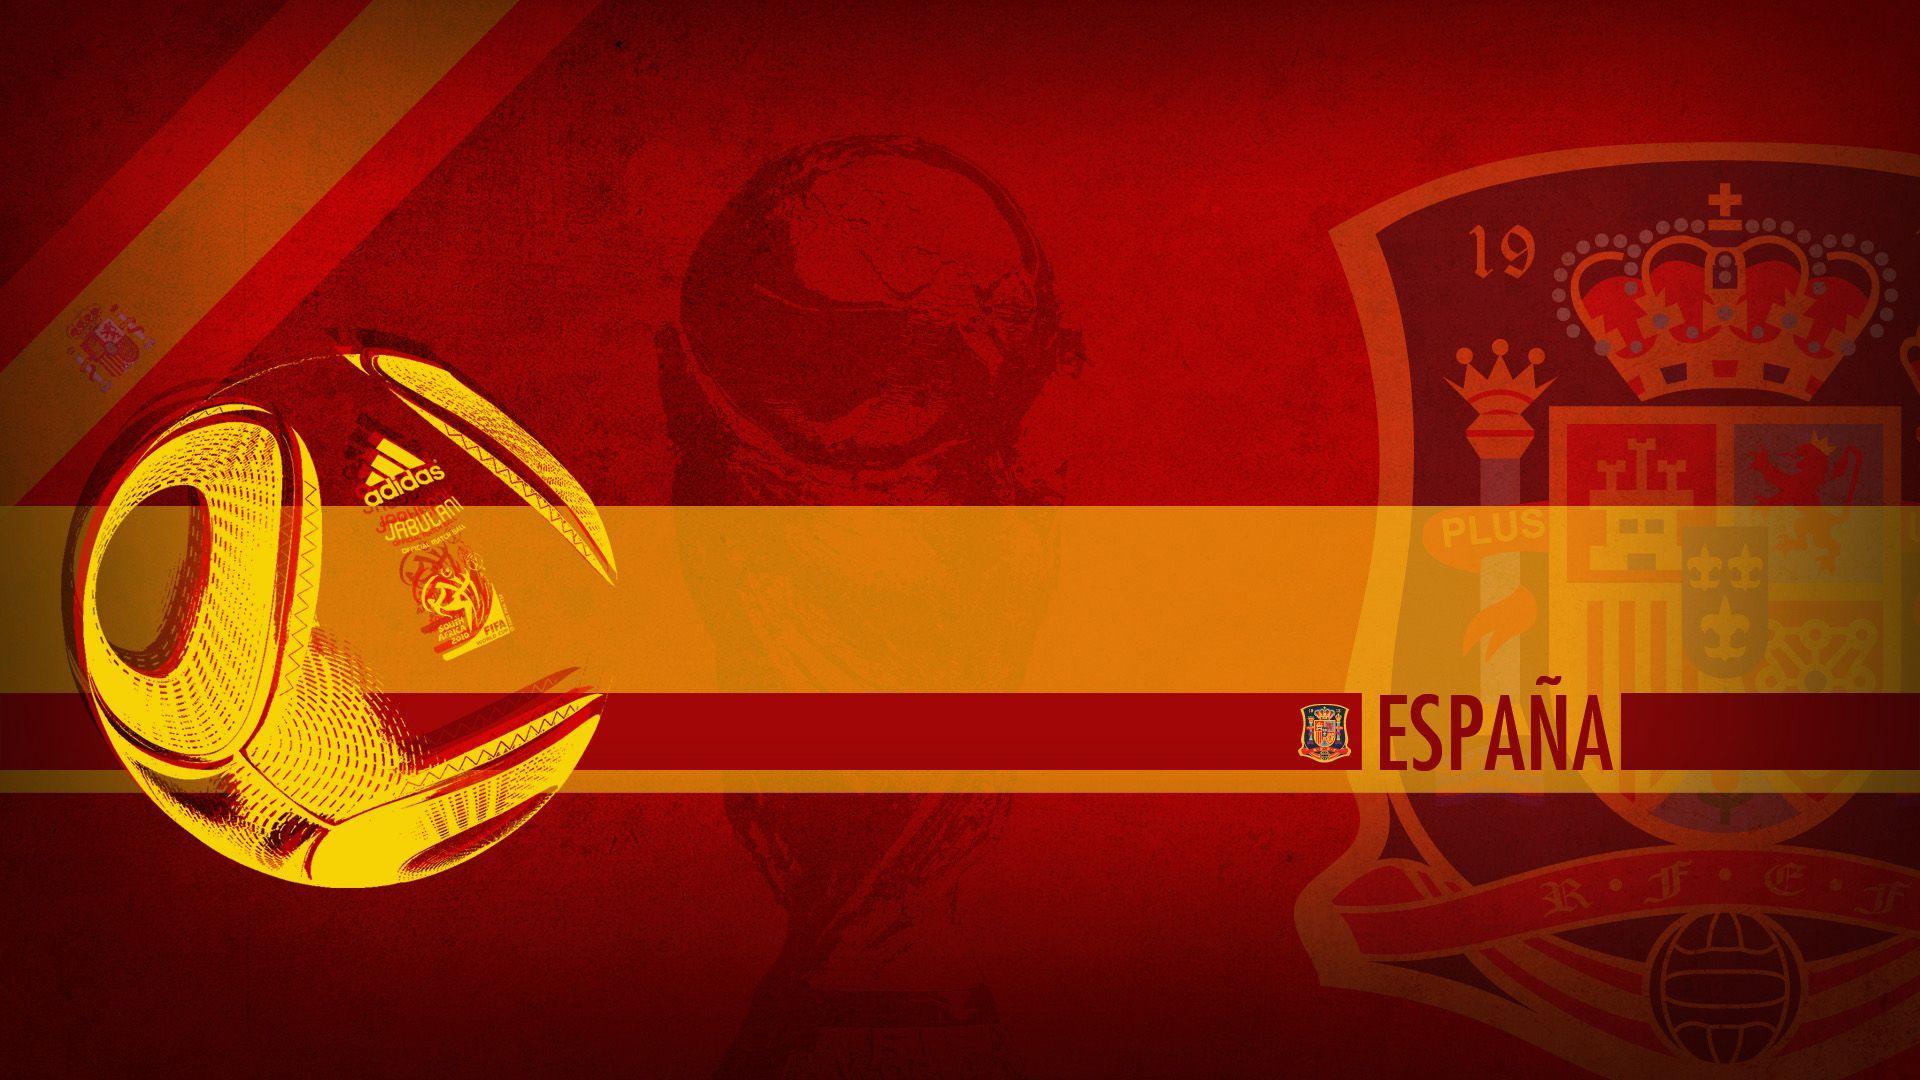 Spanish Theme Wallpapers Top Free Spanish Theme